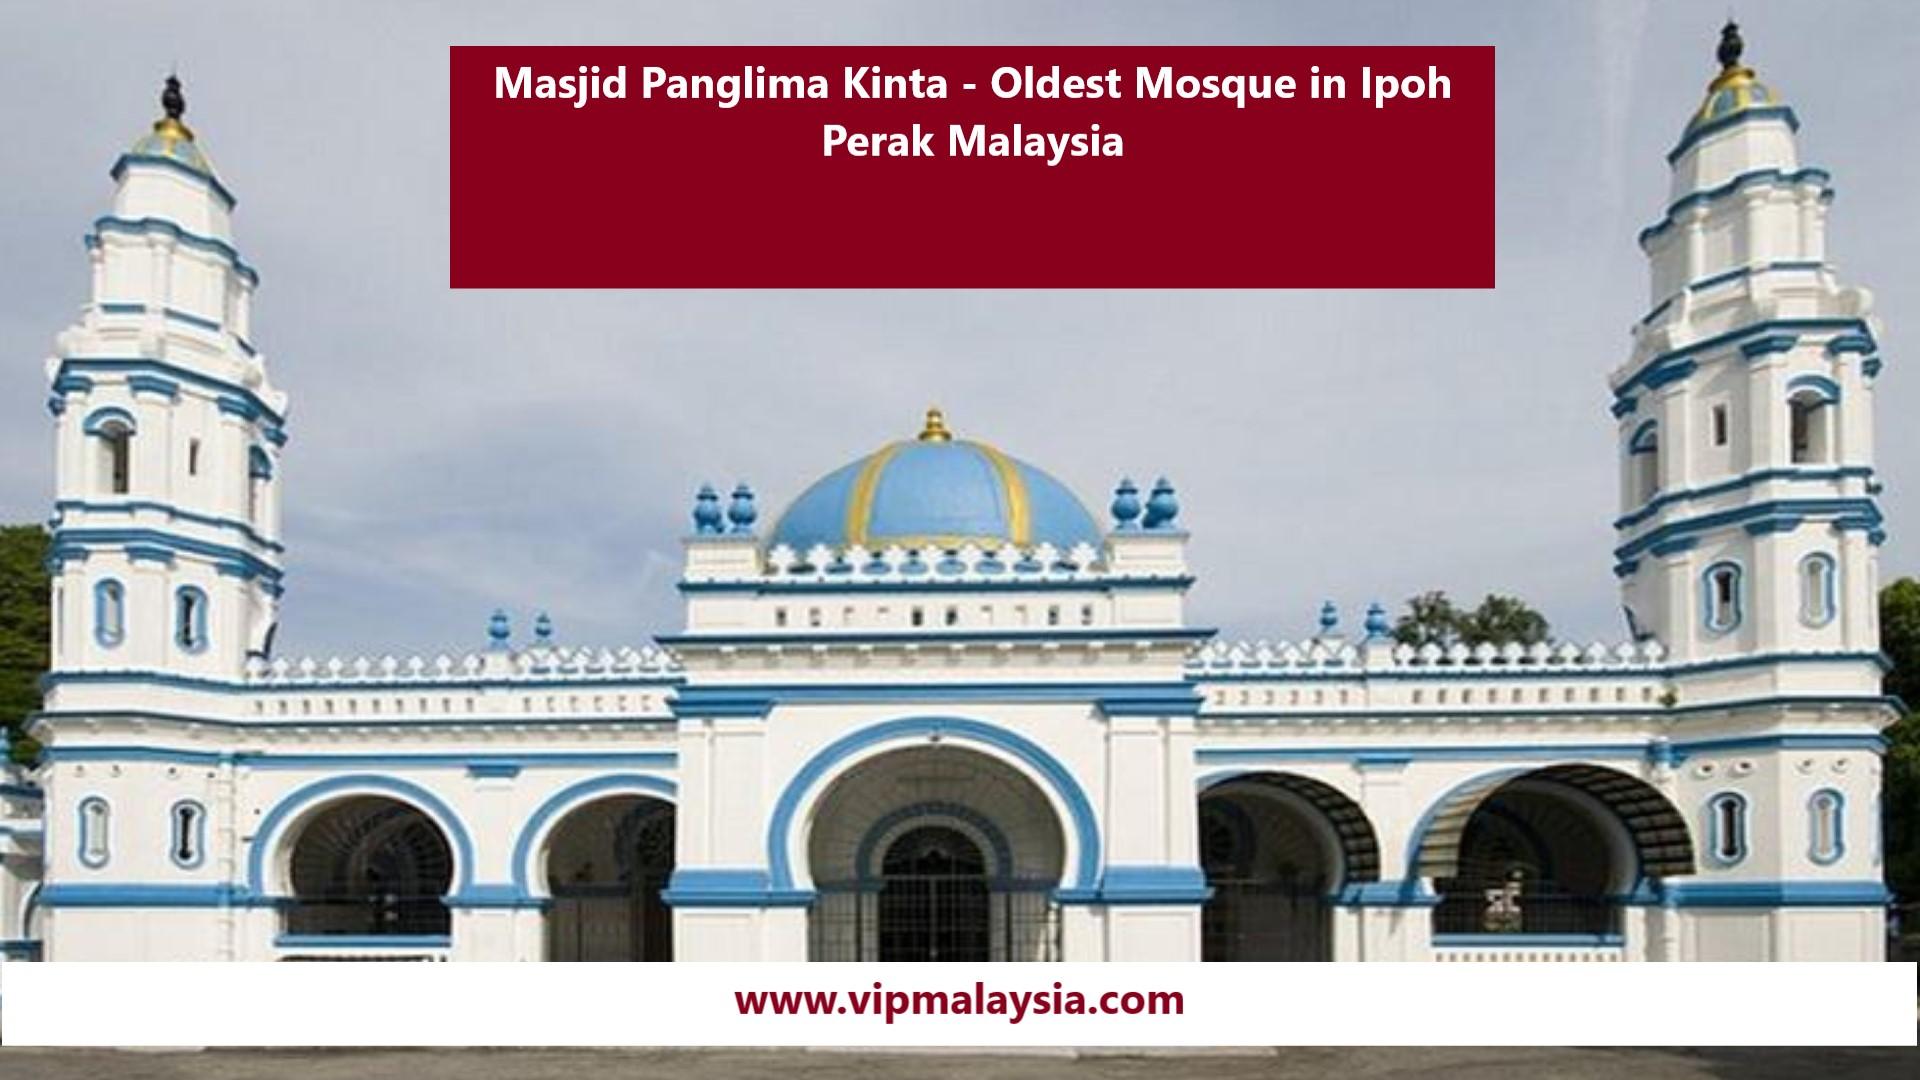 Masjid Panglima Kinta Mosque Ipoh Oldest Mosque in Perak Malaysia